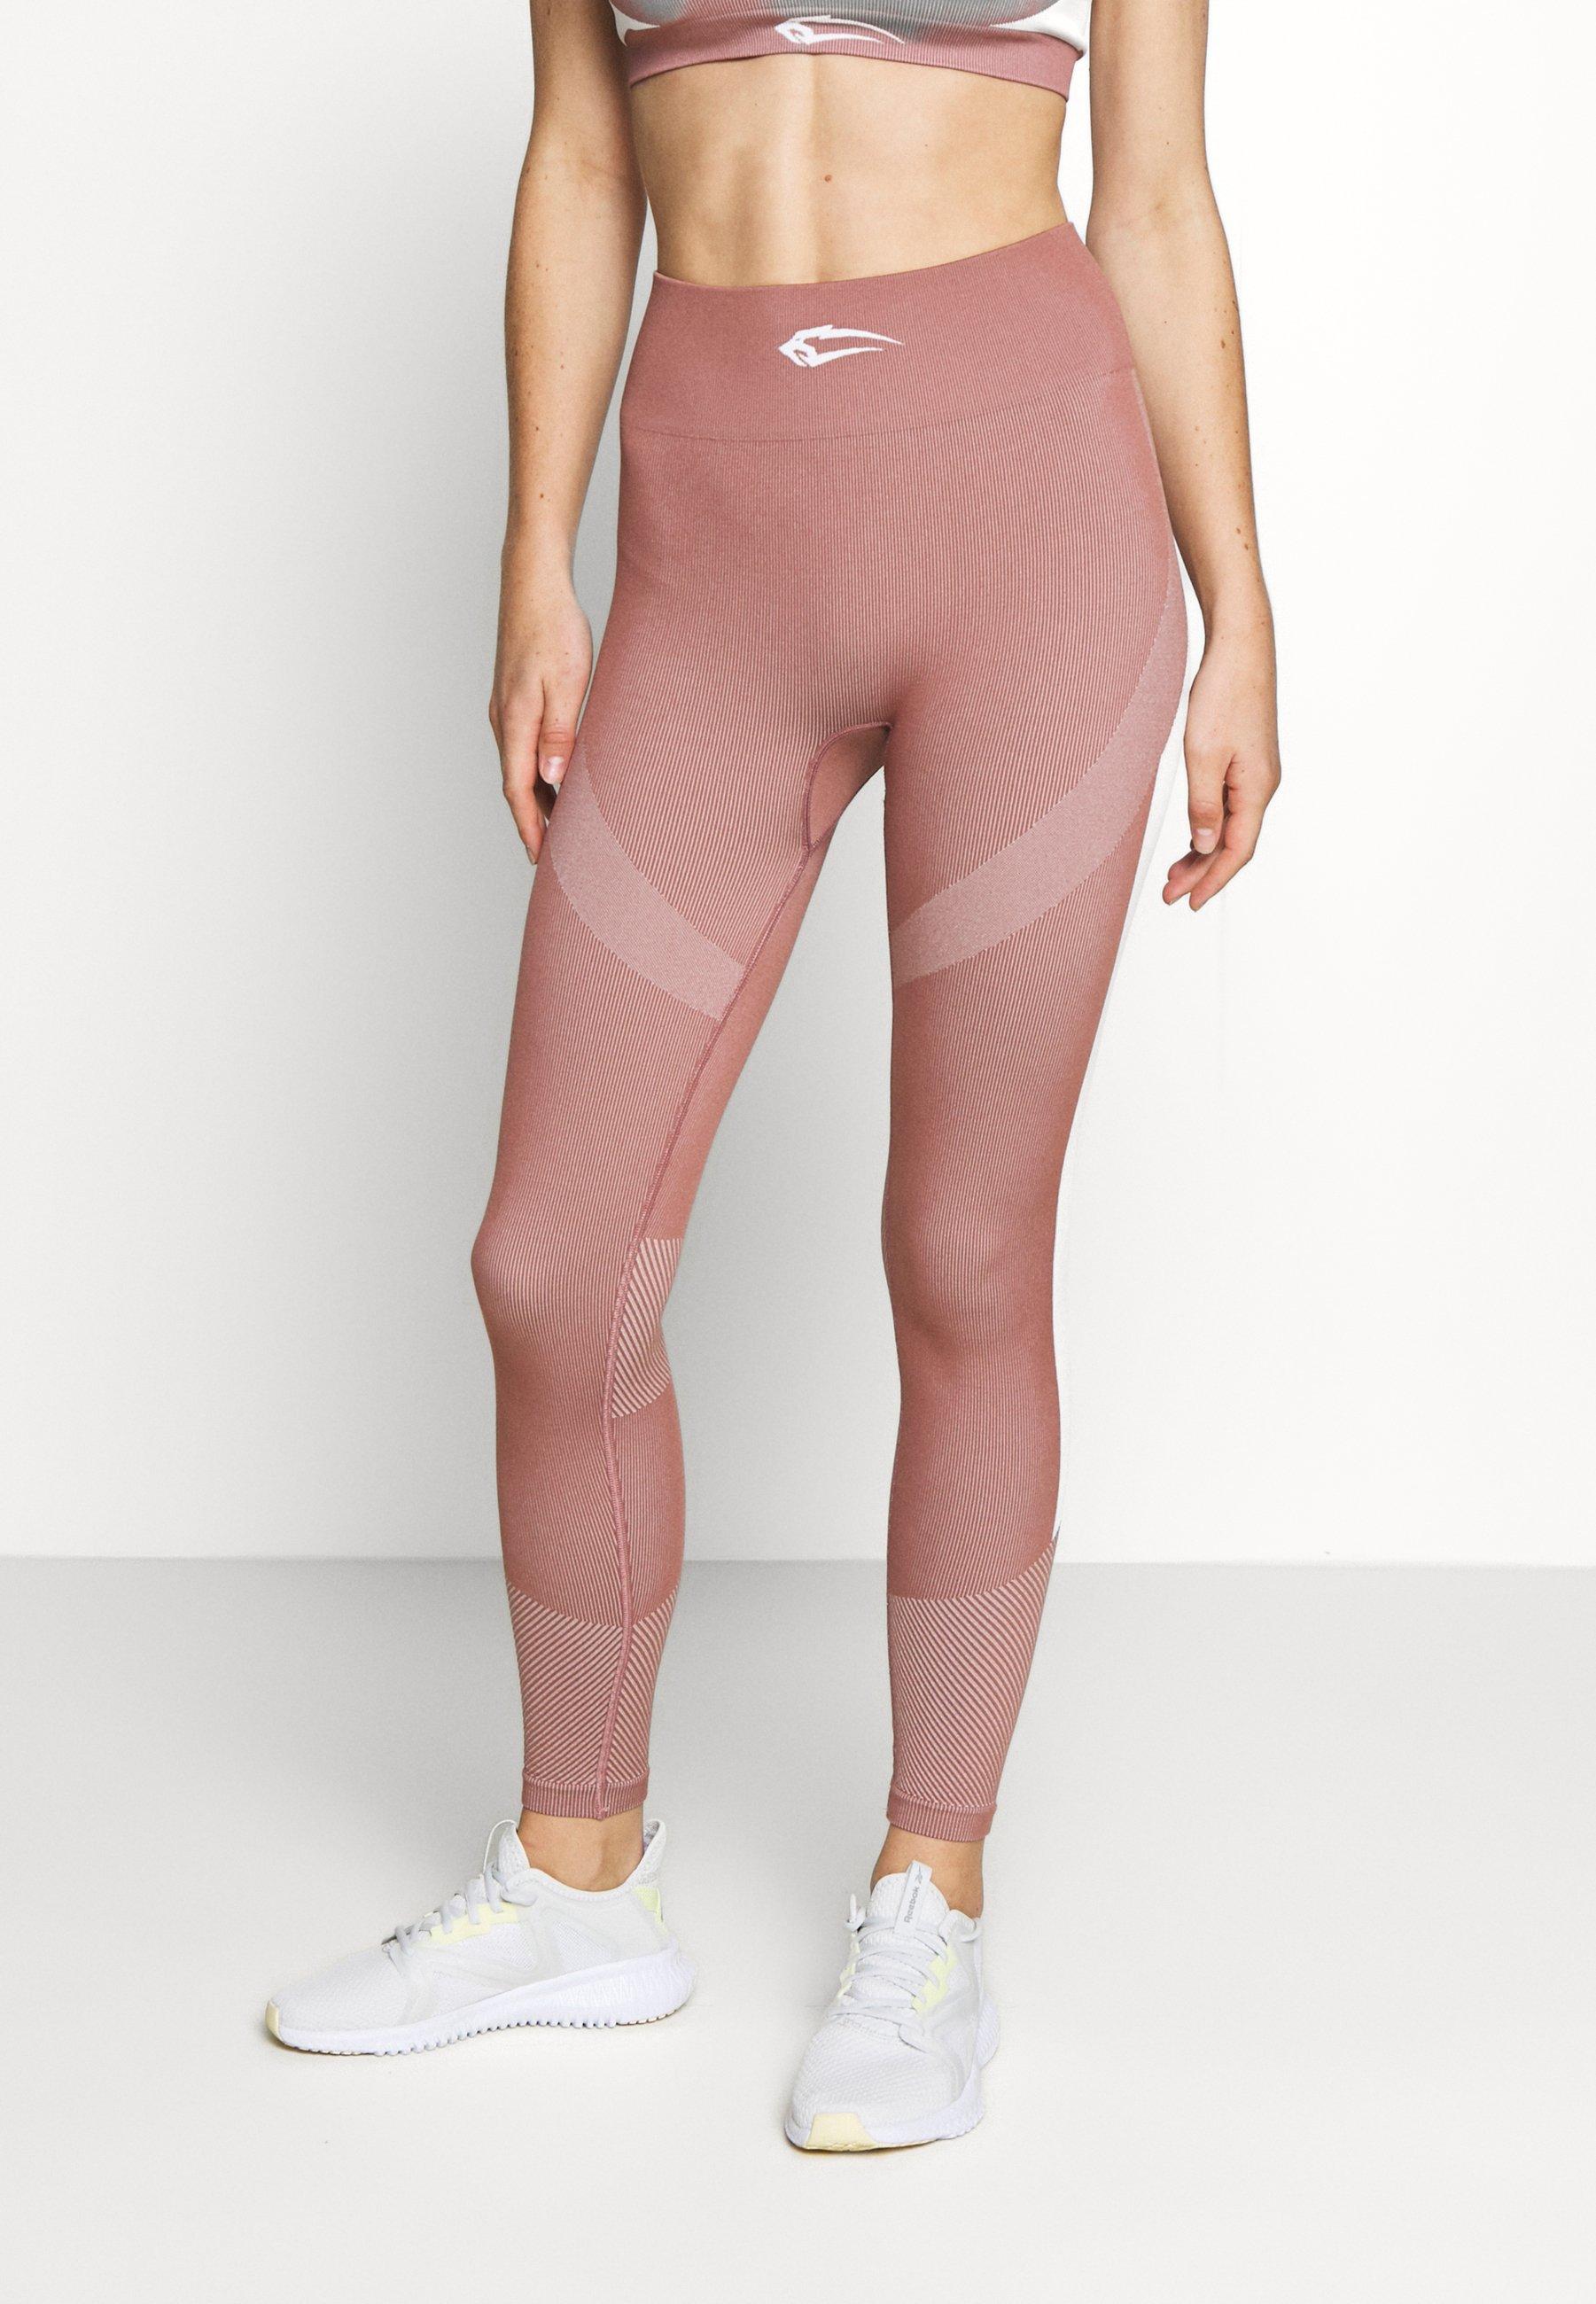 Femme SEAMLESS LEGGINGS ULTIMATE - Collants